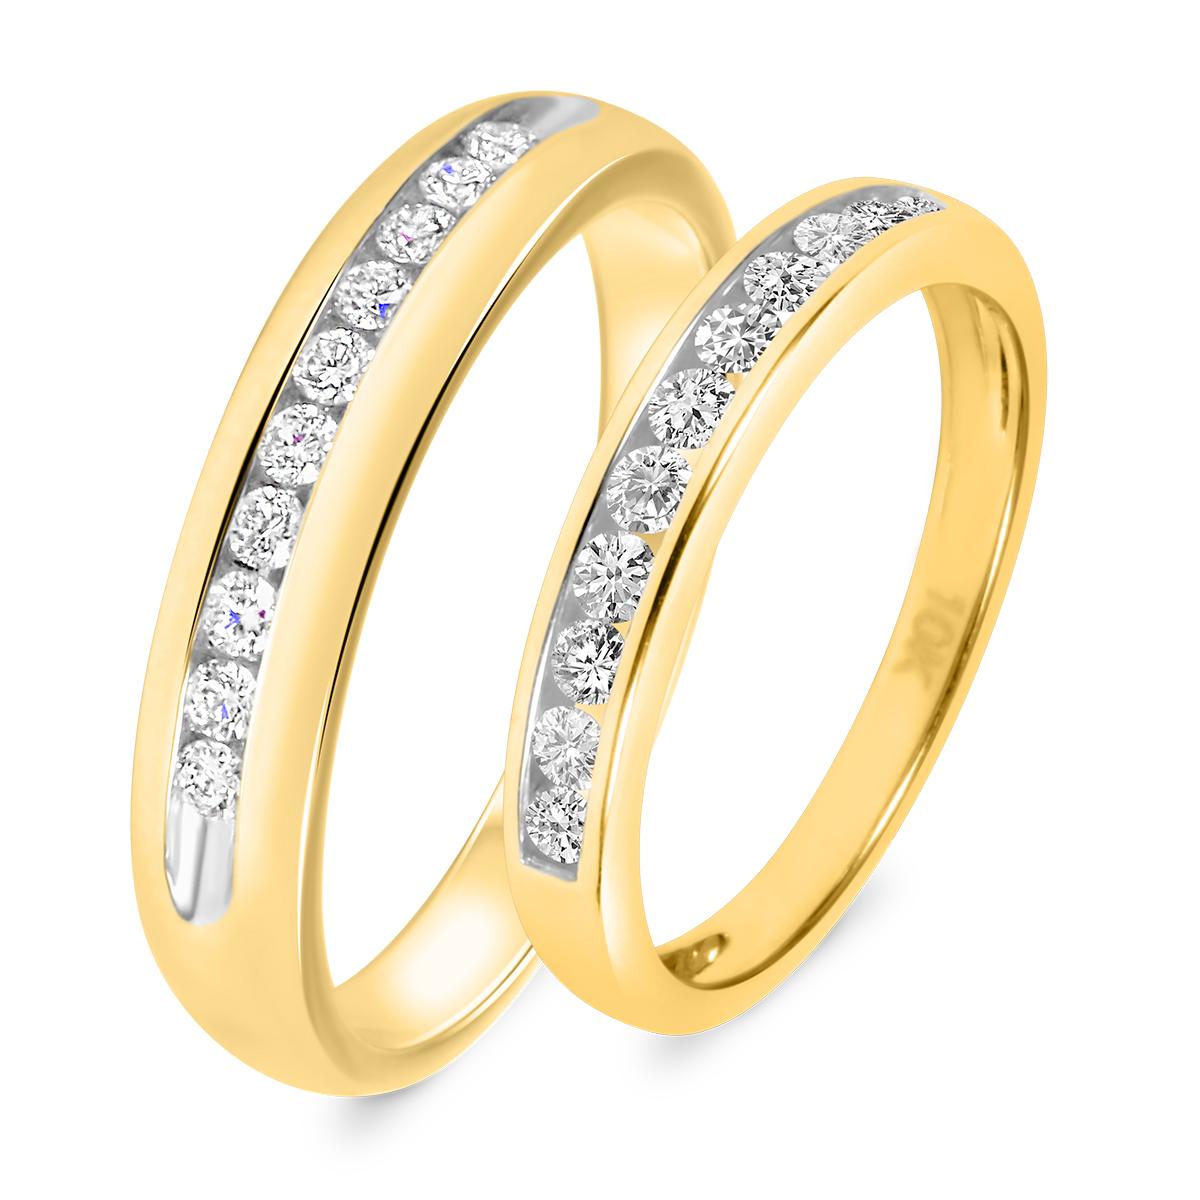 7897b28e841 ... Gold 5 8 Carat T.W. Round Cut Diamond His And Hers Wedding Band Set 14K  Yellow 1 8 ...